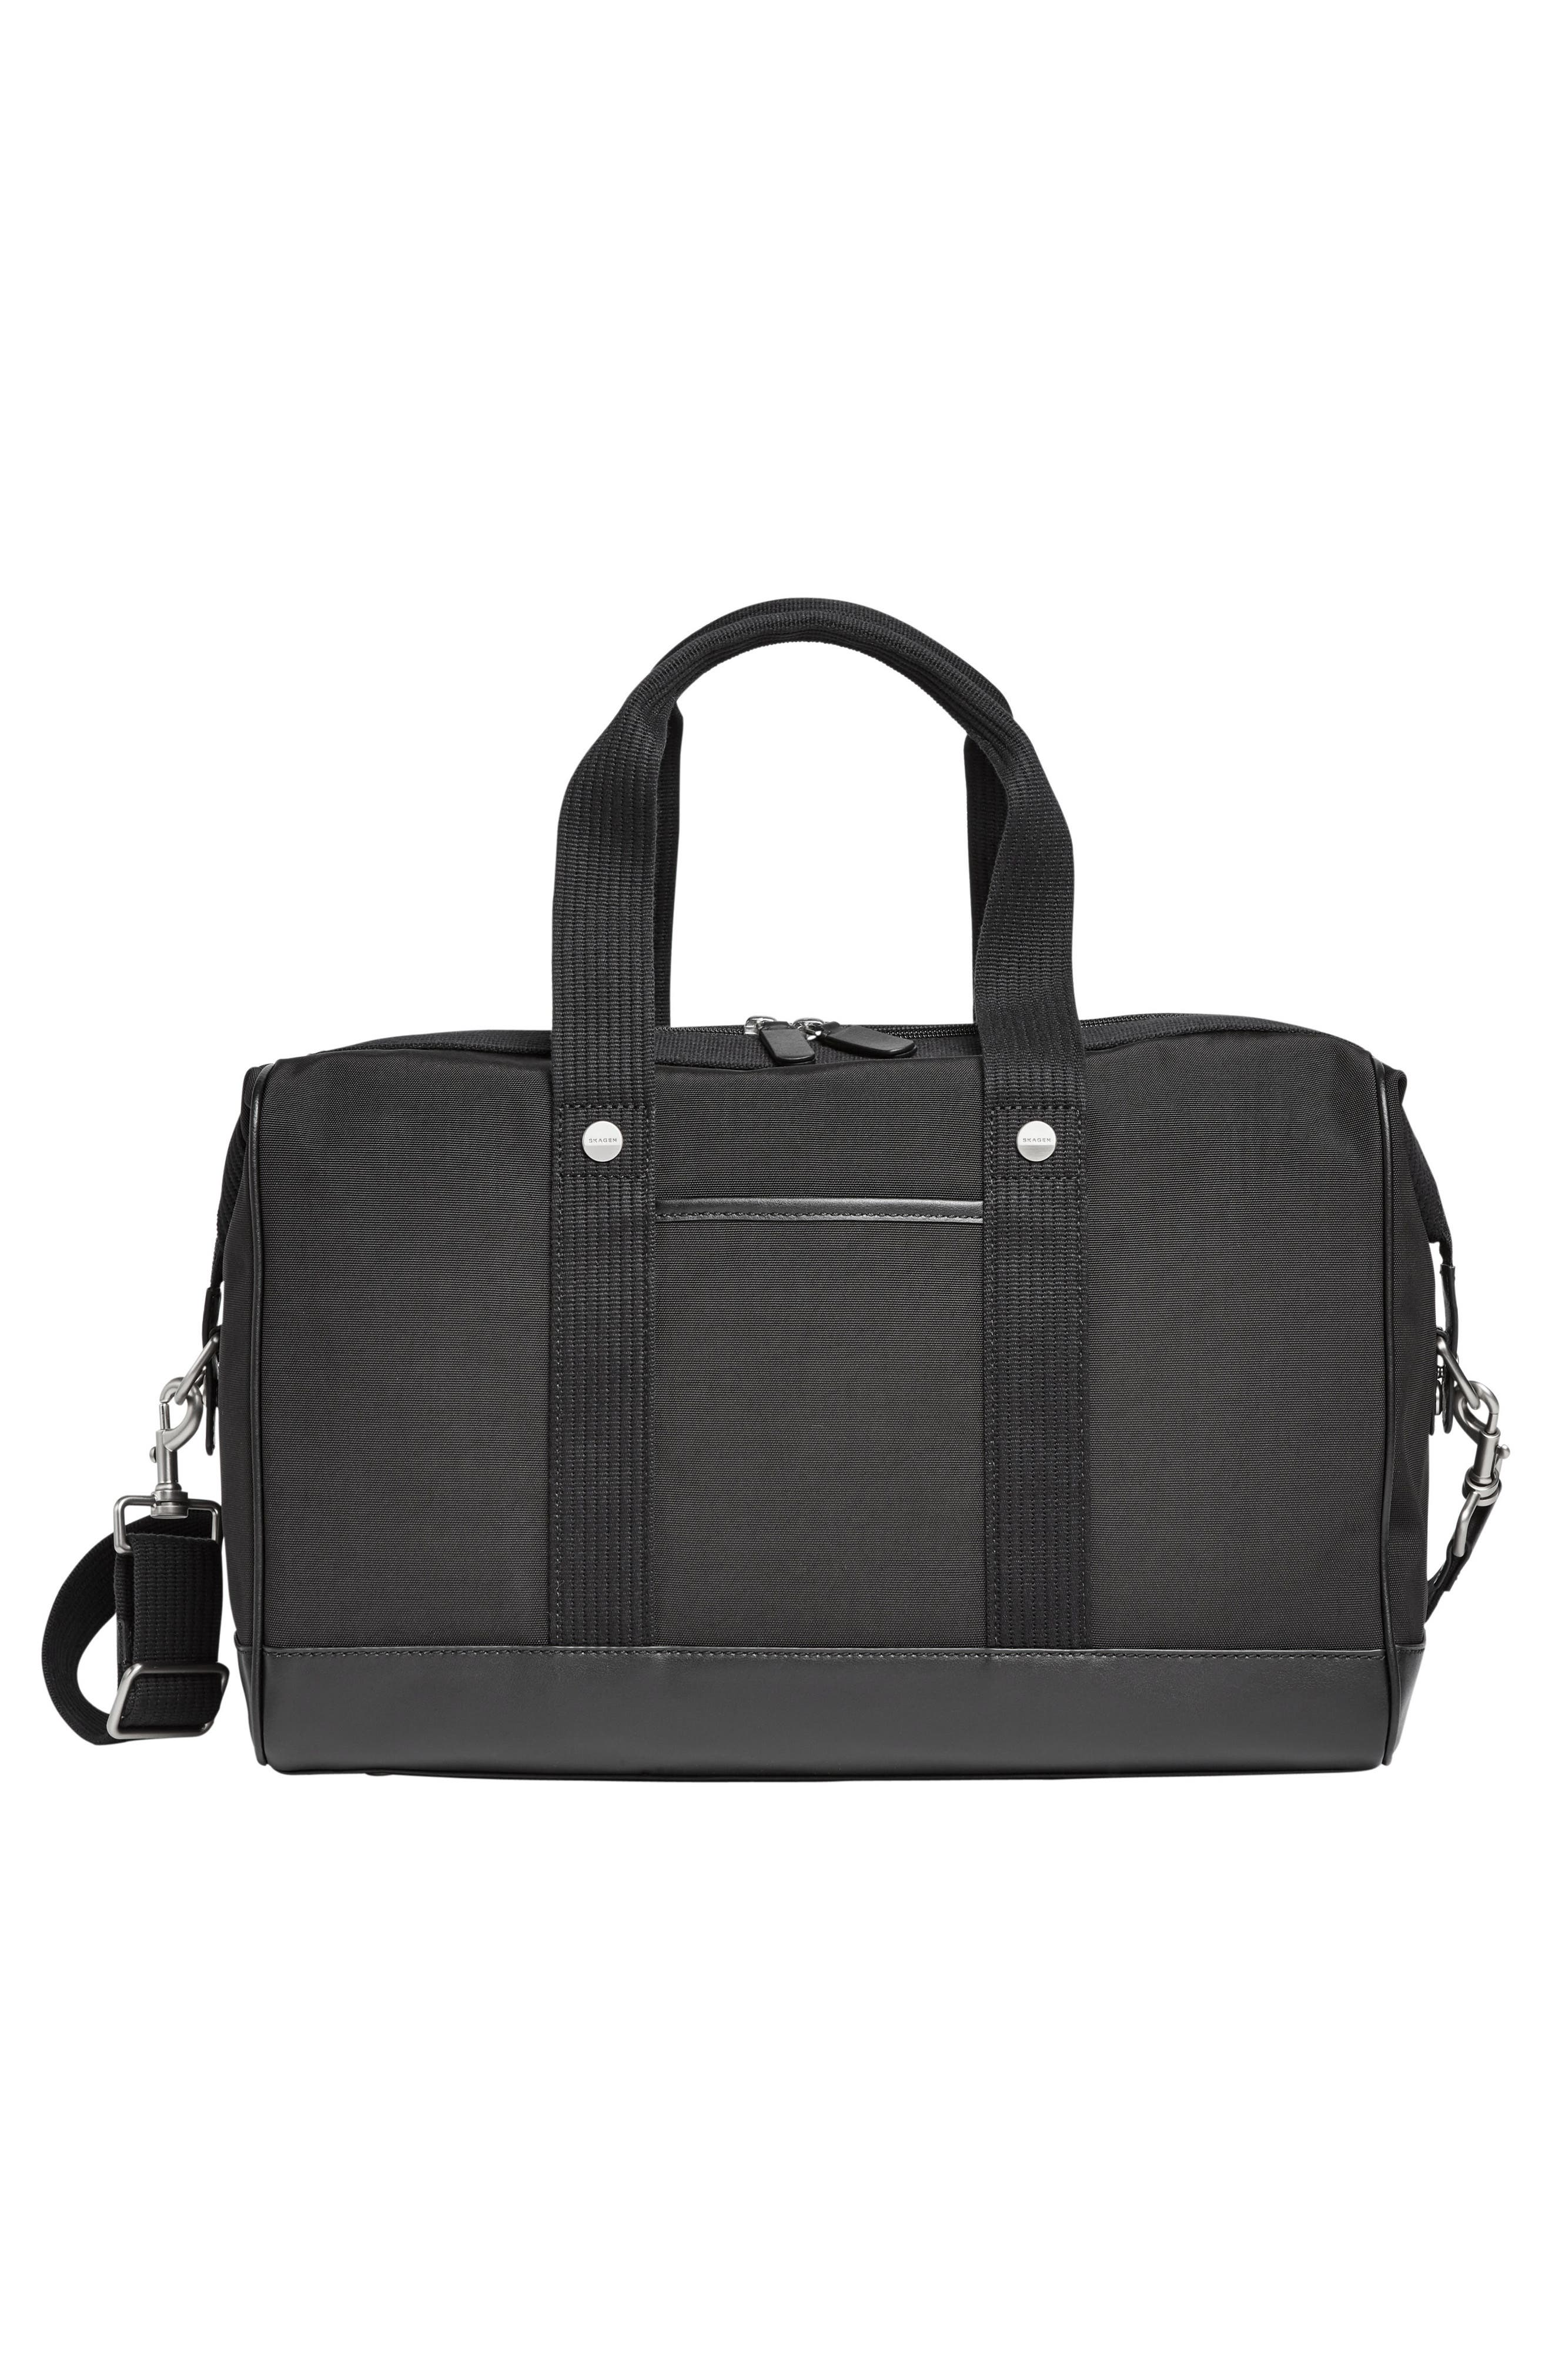 Krinsen Duffel Bag,                             Alternate thumbnail 2, color,                             Black